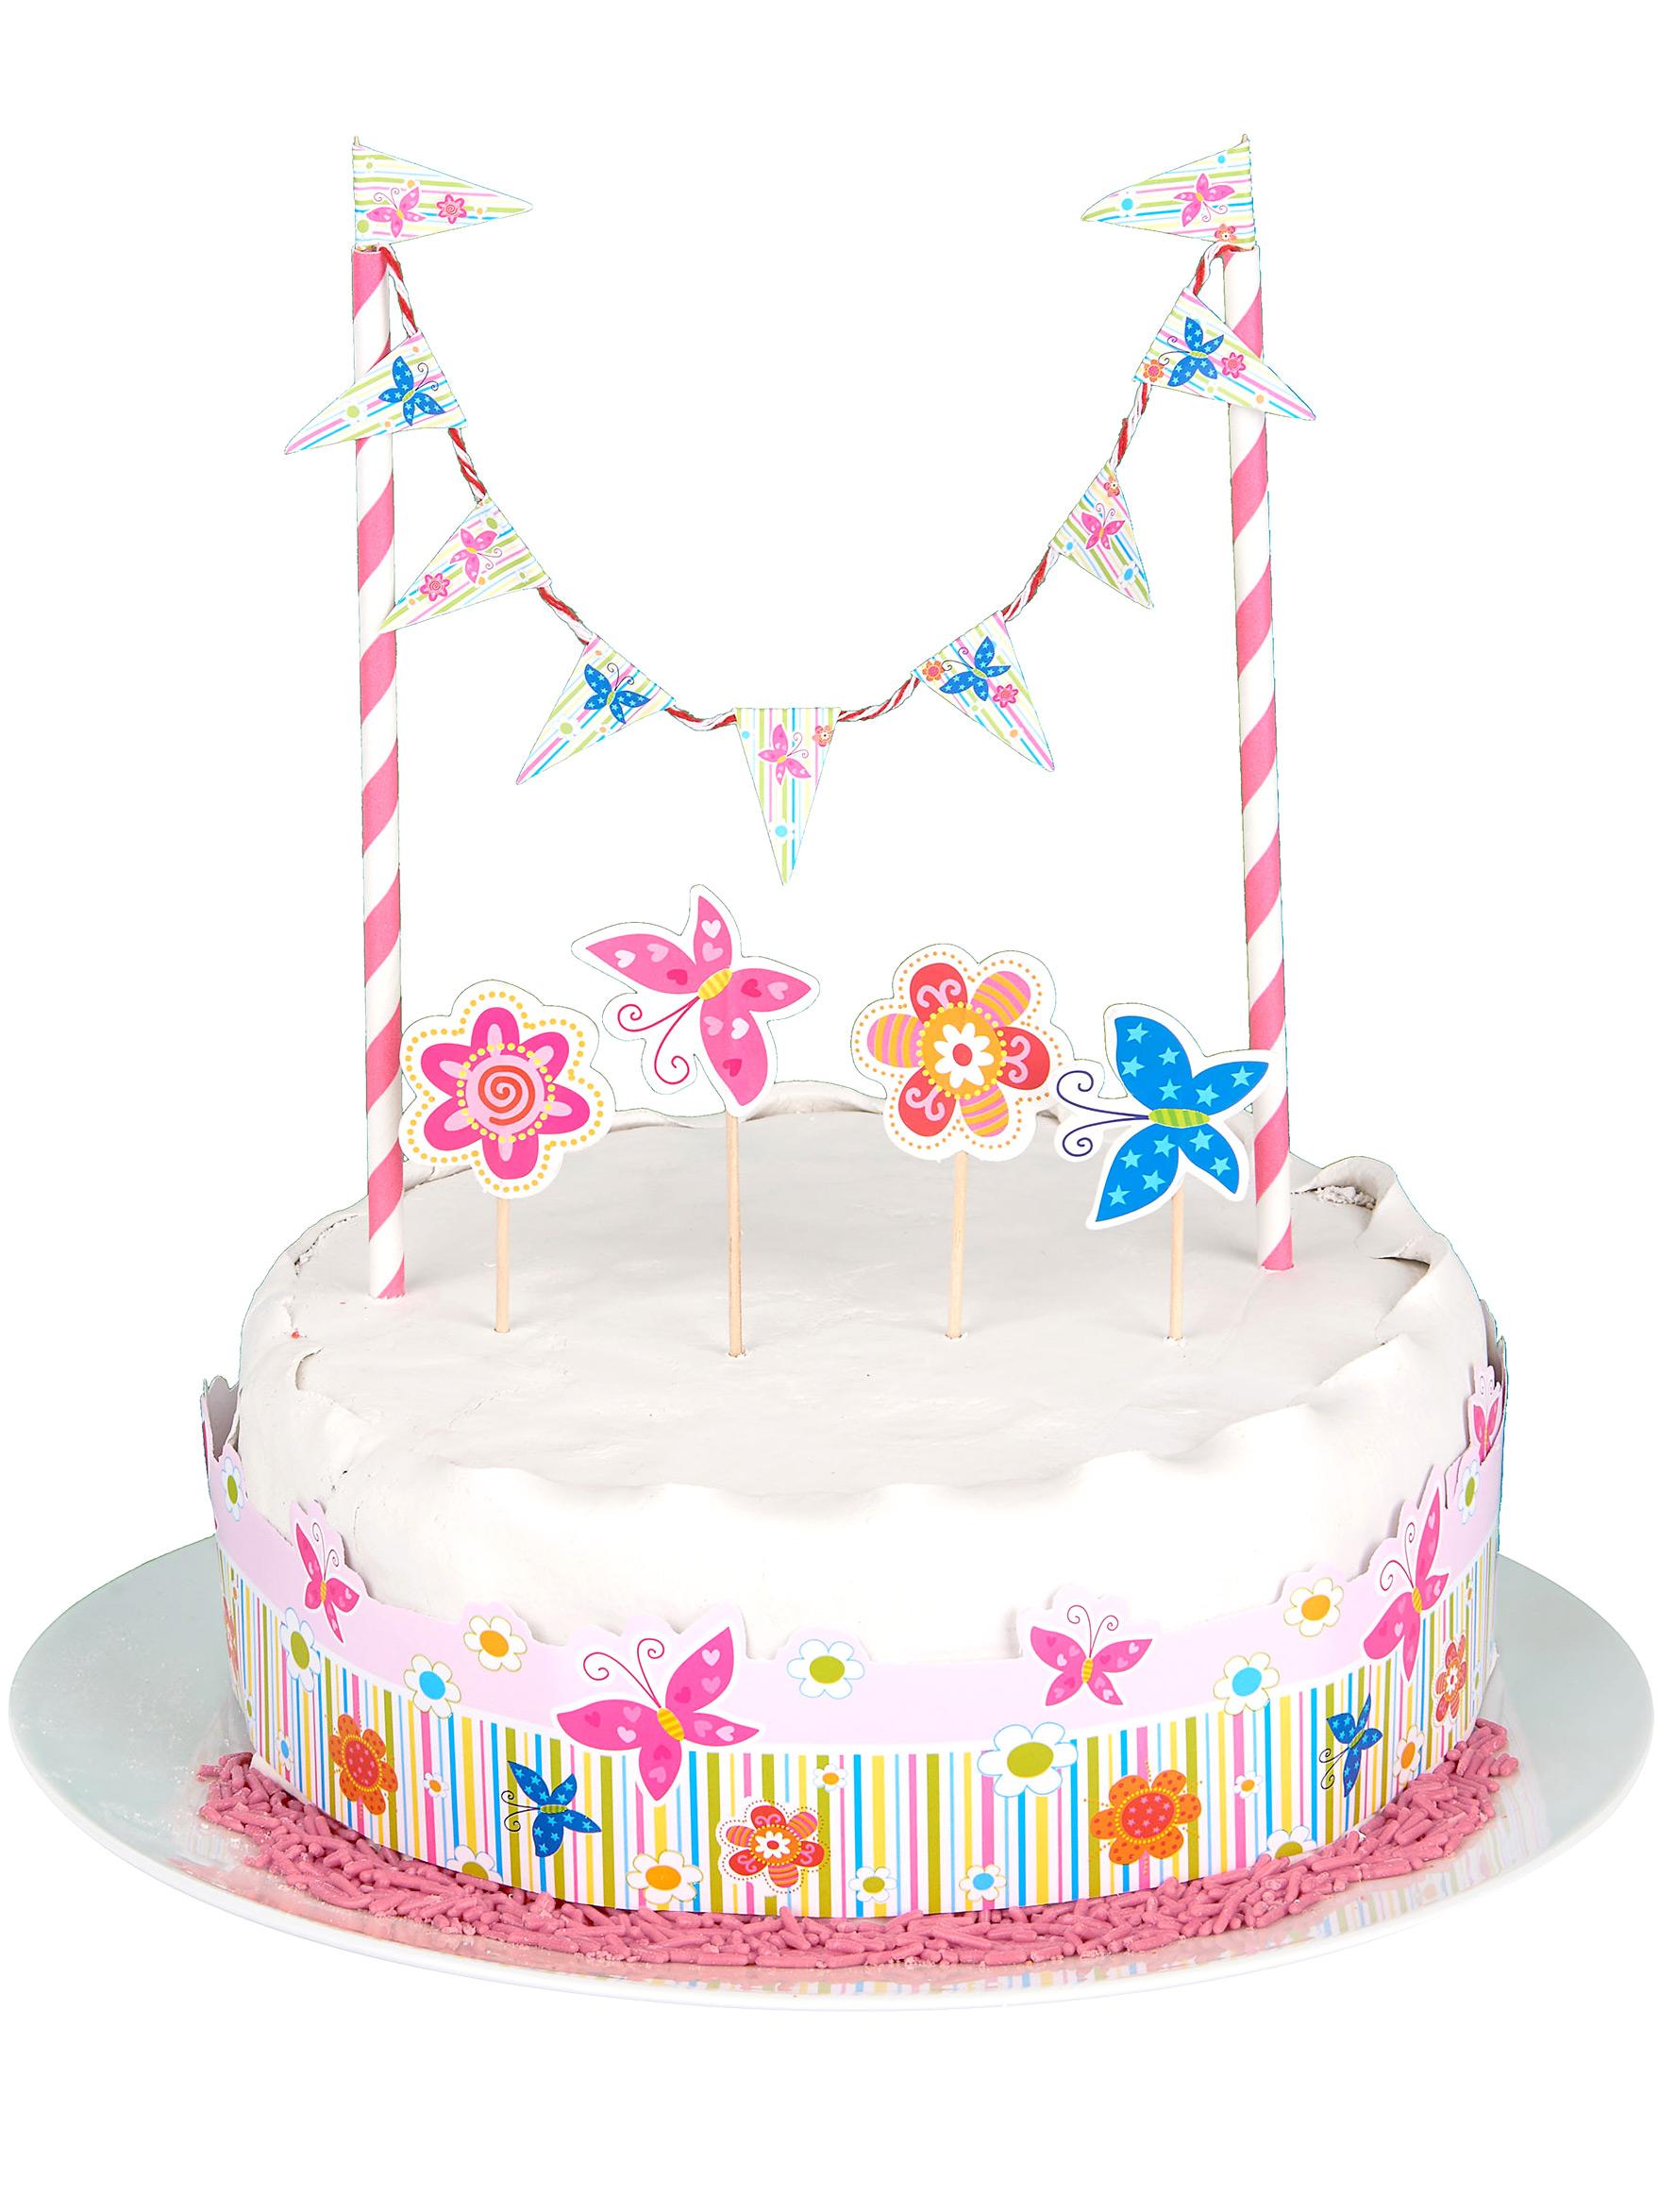 Decorazione per torte bambina addobbi e vestiti di carnevale online vegaoo - Decorazioni per torte di carnevale ...